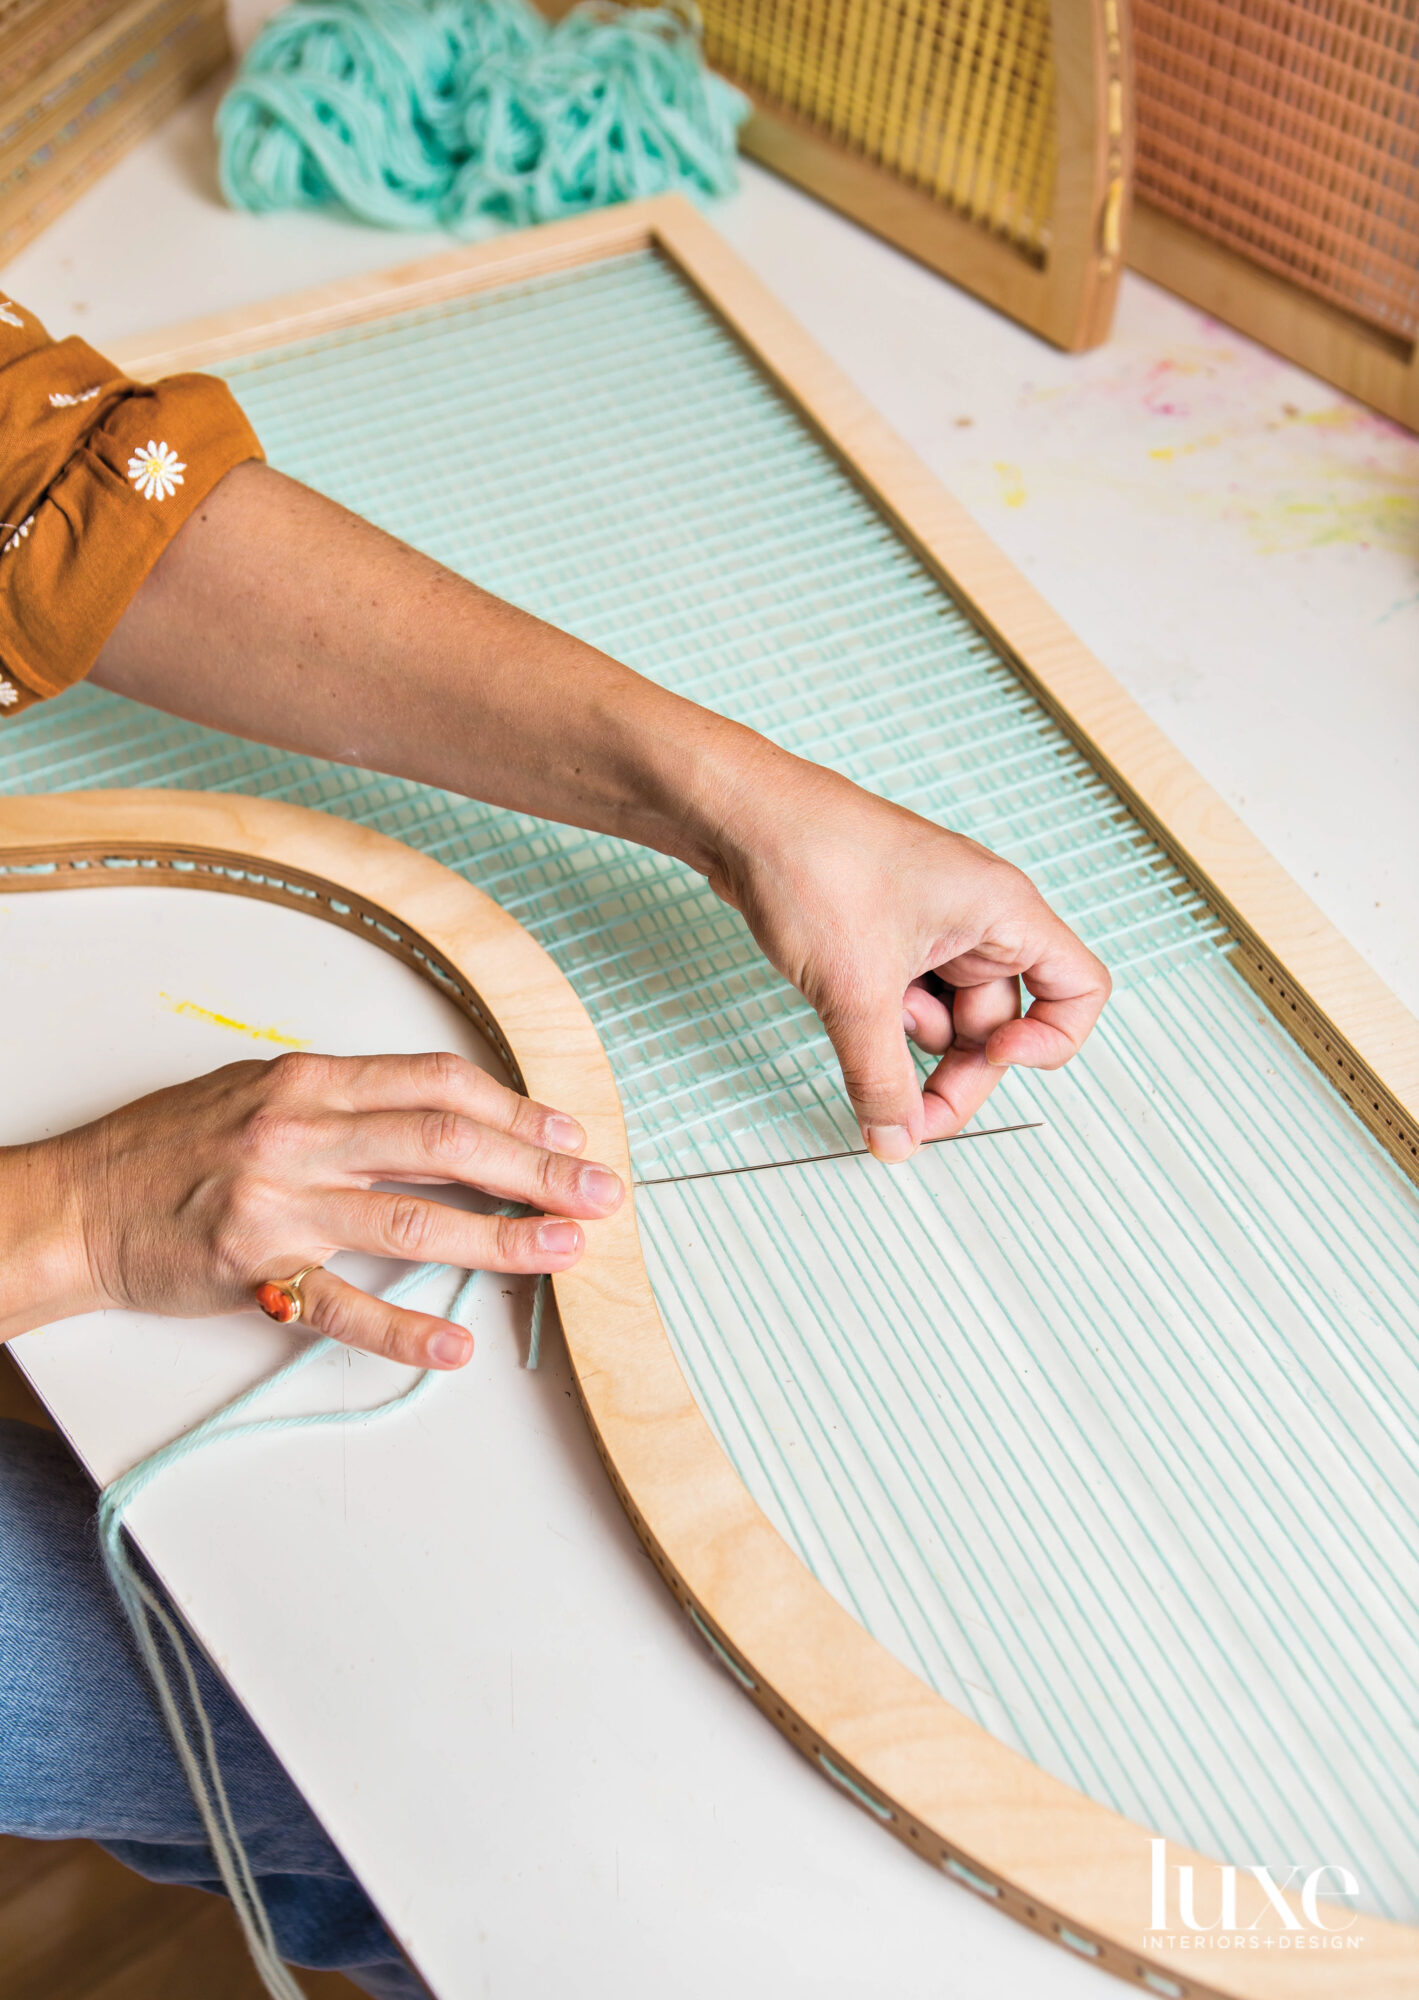 artist Hayley Sheldon threads mint-colored yarn into a screen